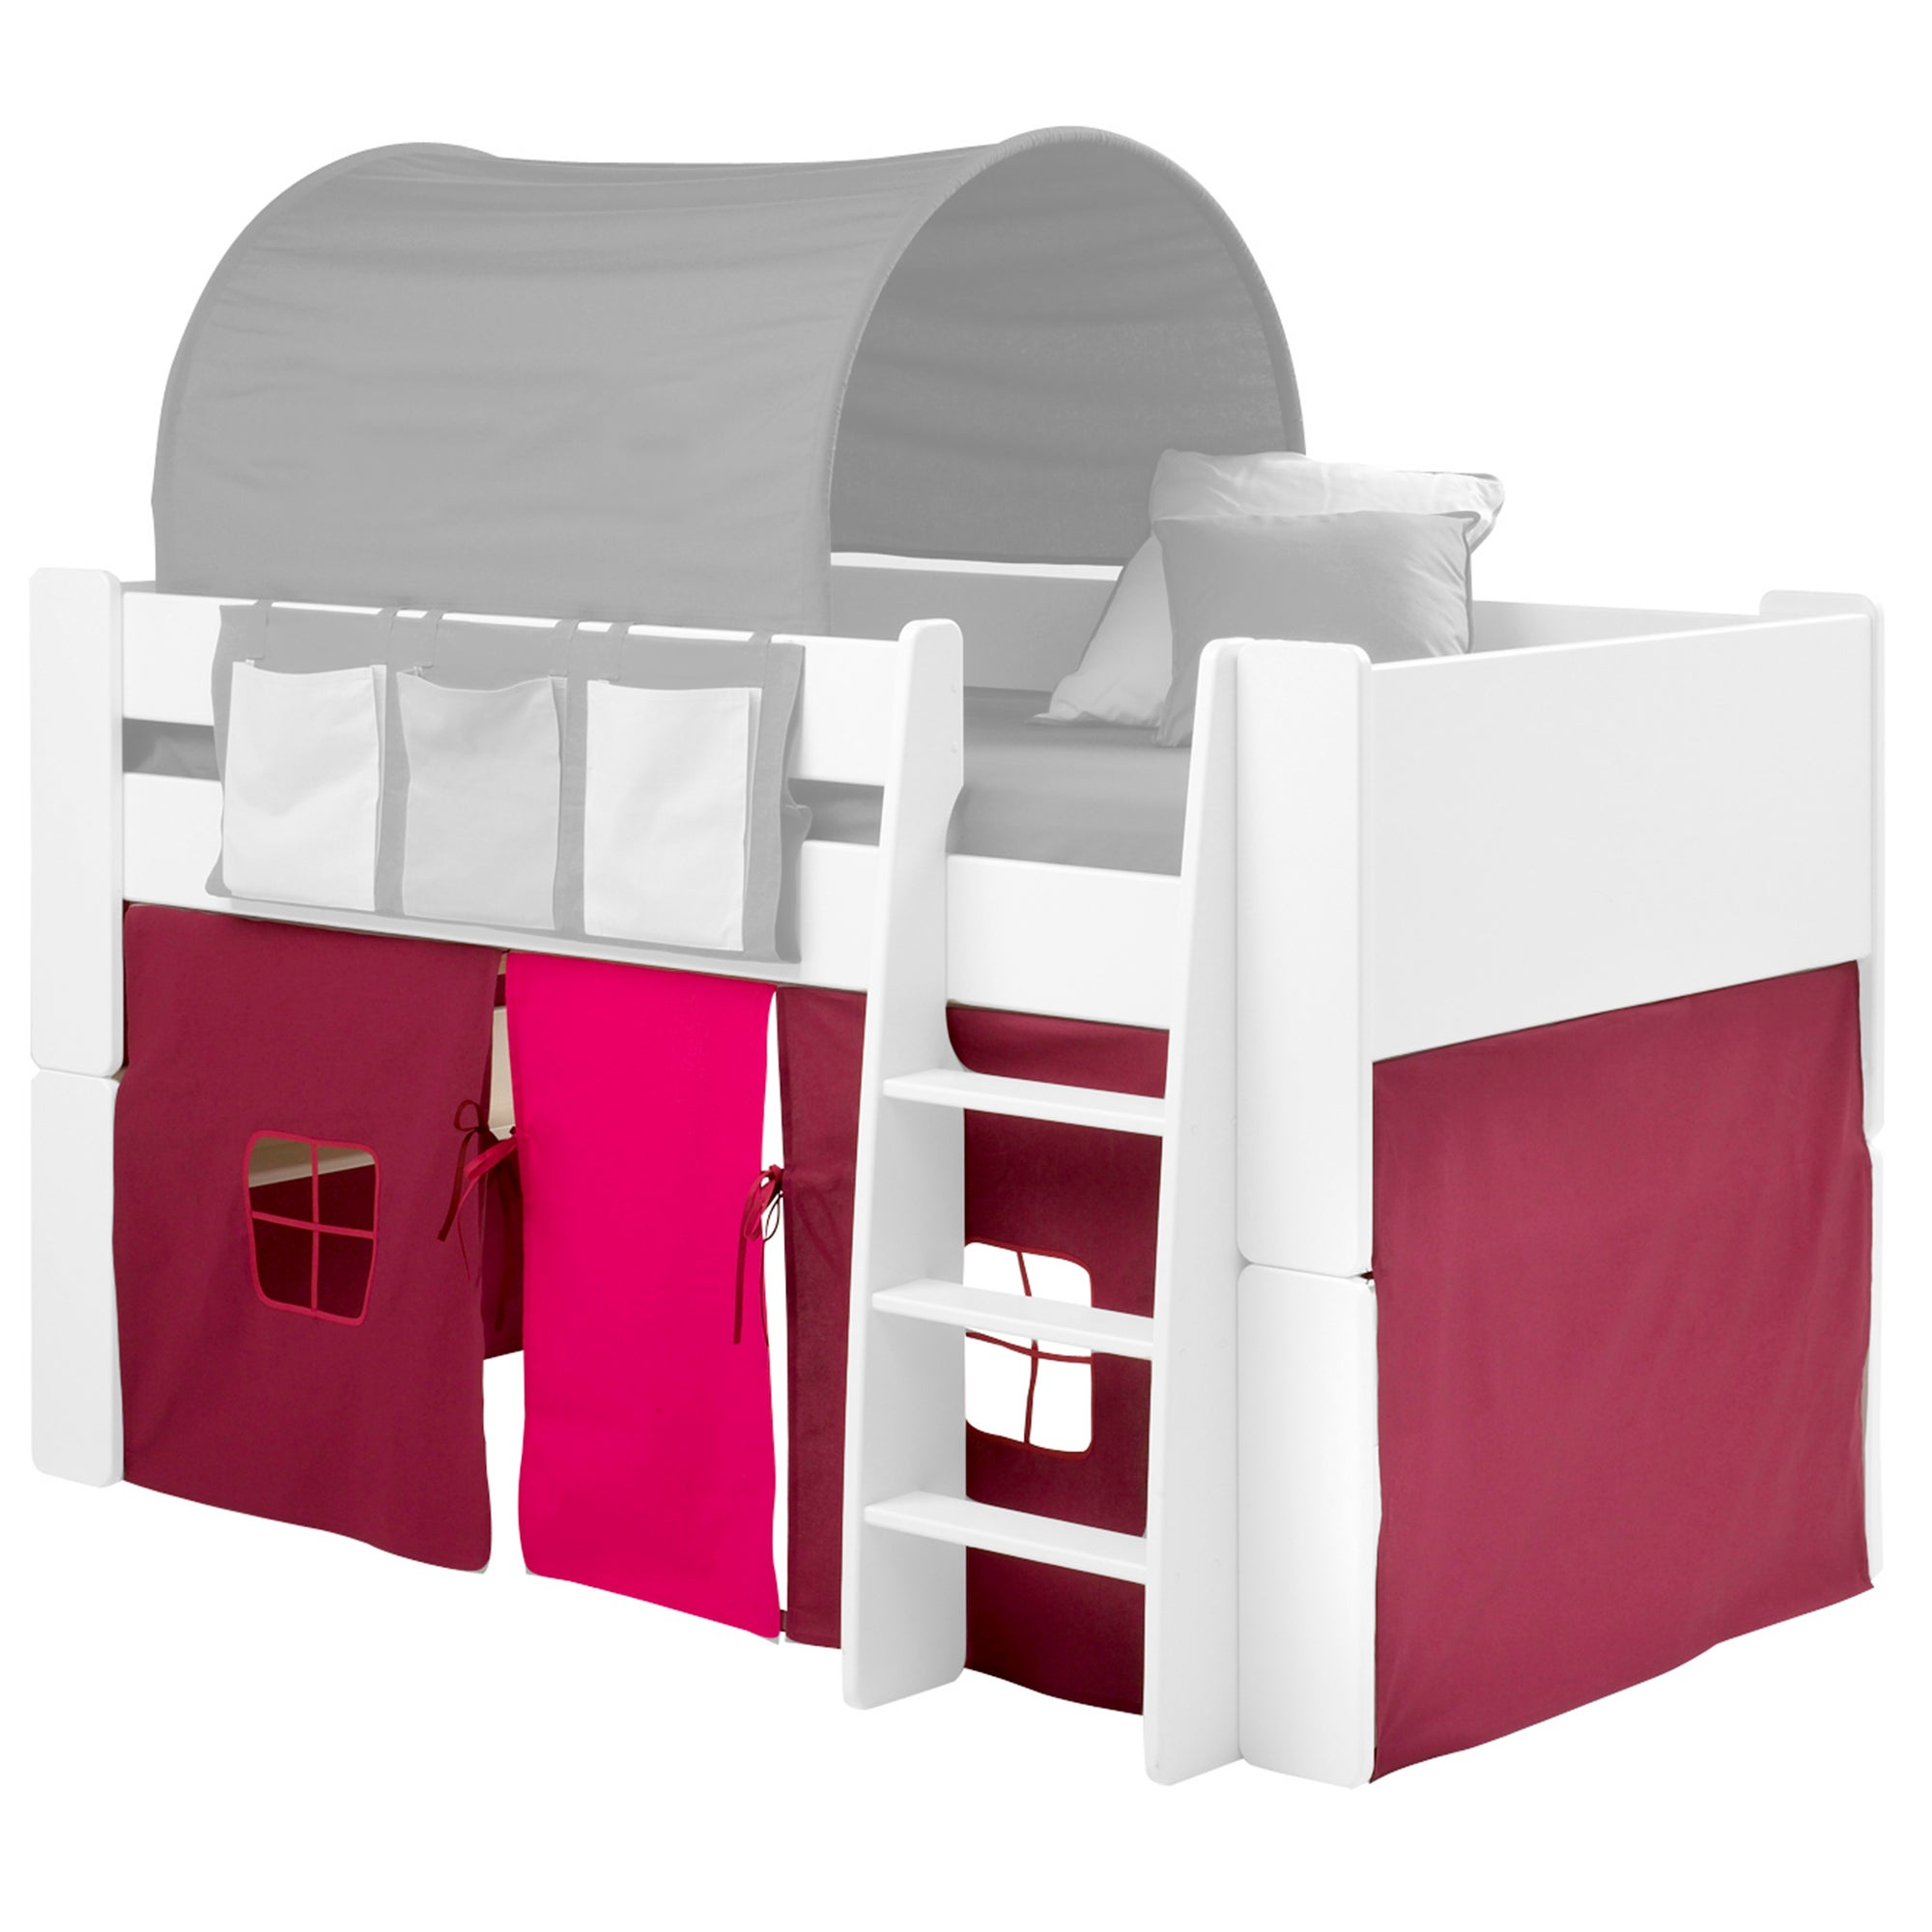 Purple Tent For Mid-Sleeper